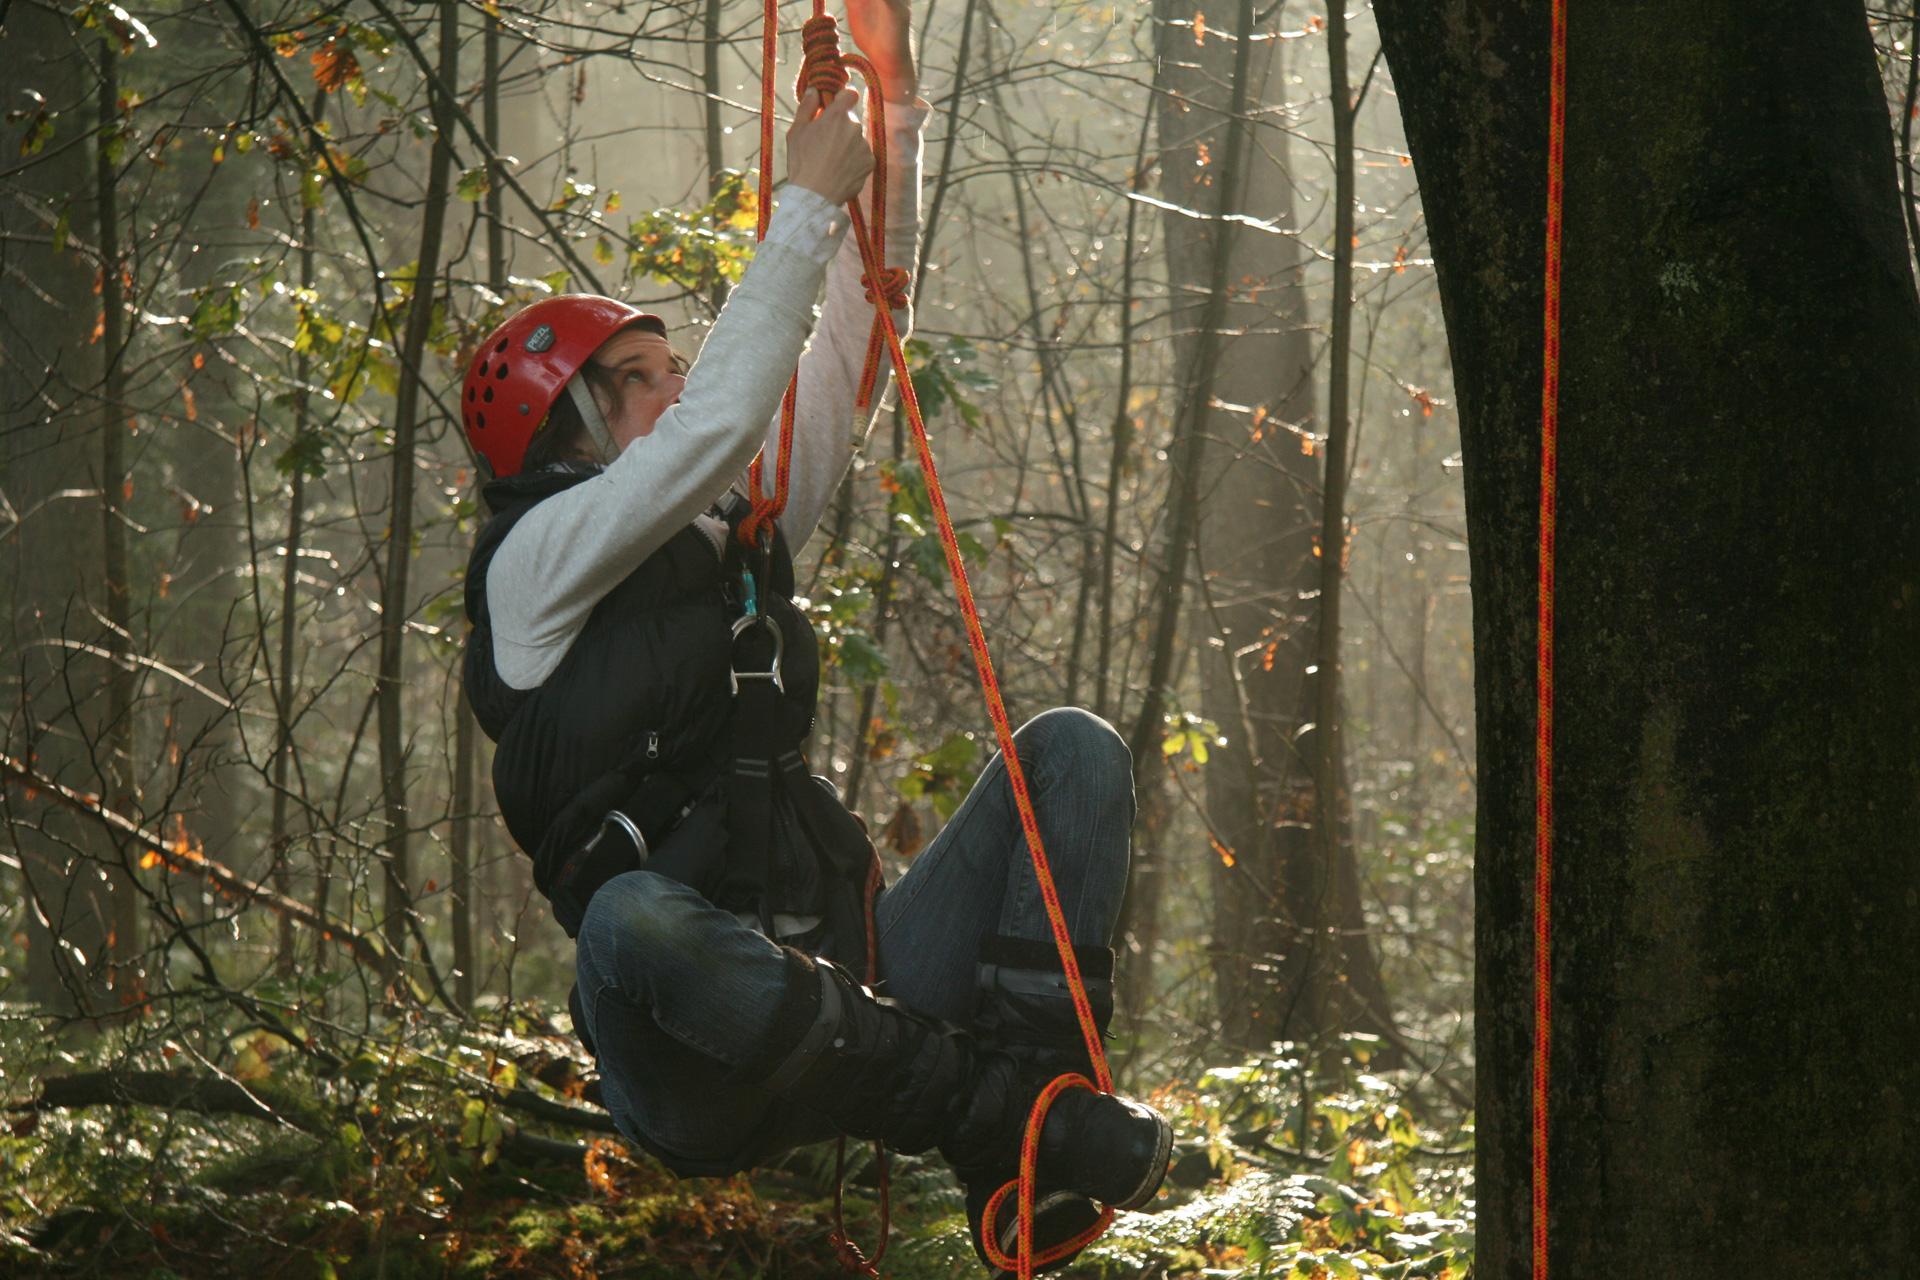 Boomklimmen bij The Treeclimbing Company